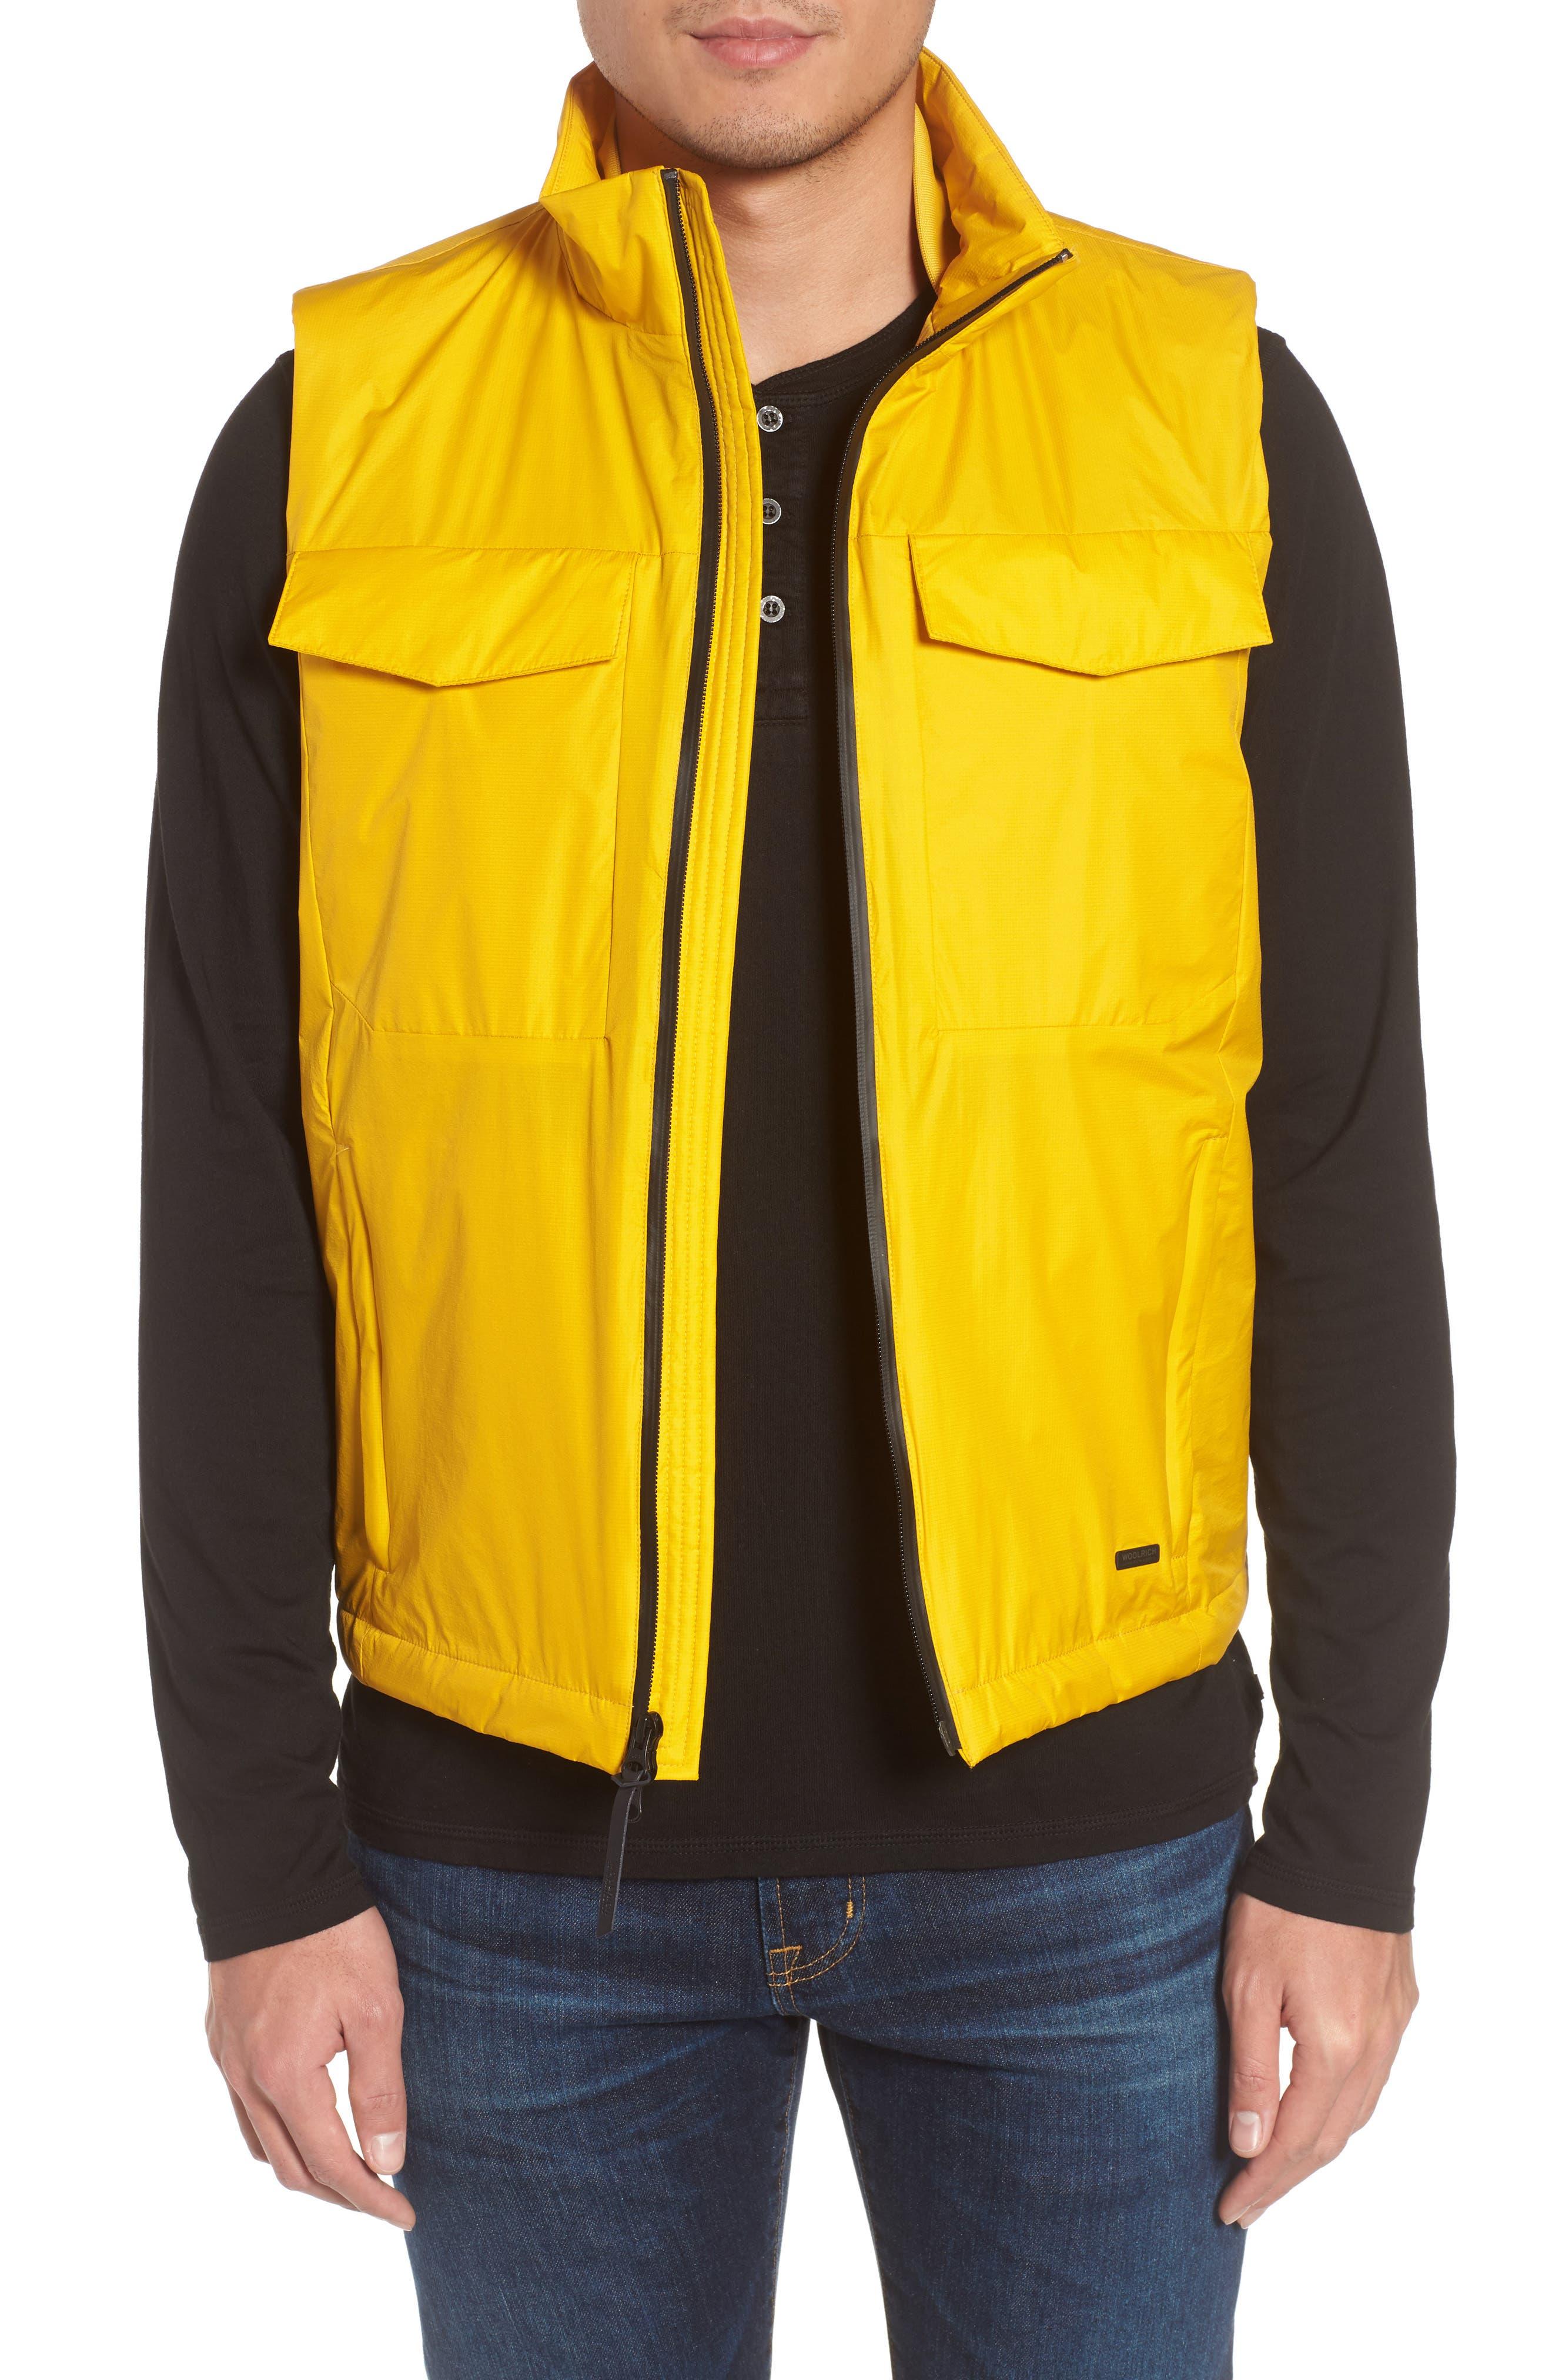 & Bros. Bering Vest,                         Main,                         color, 700